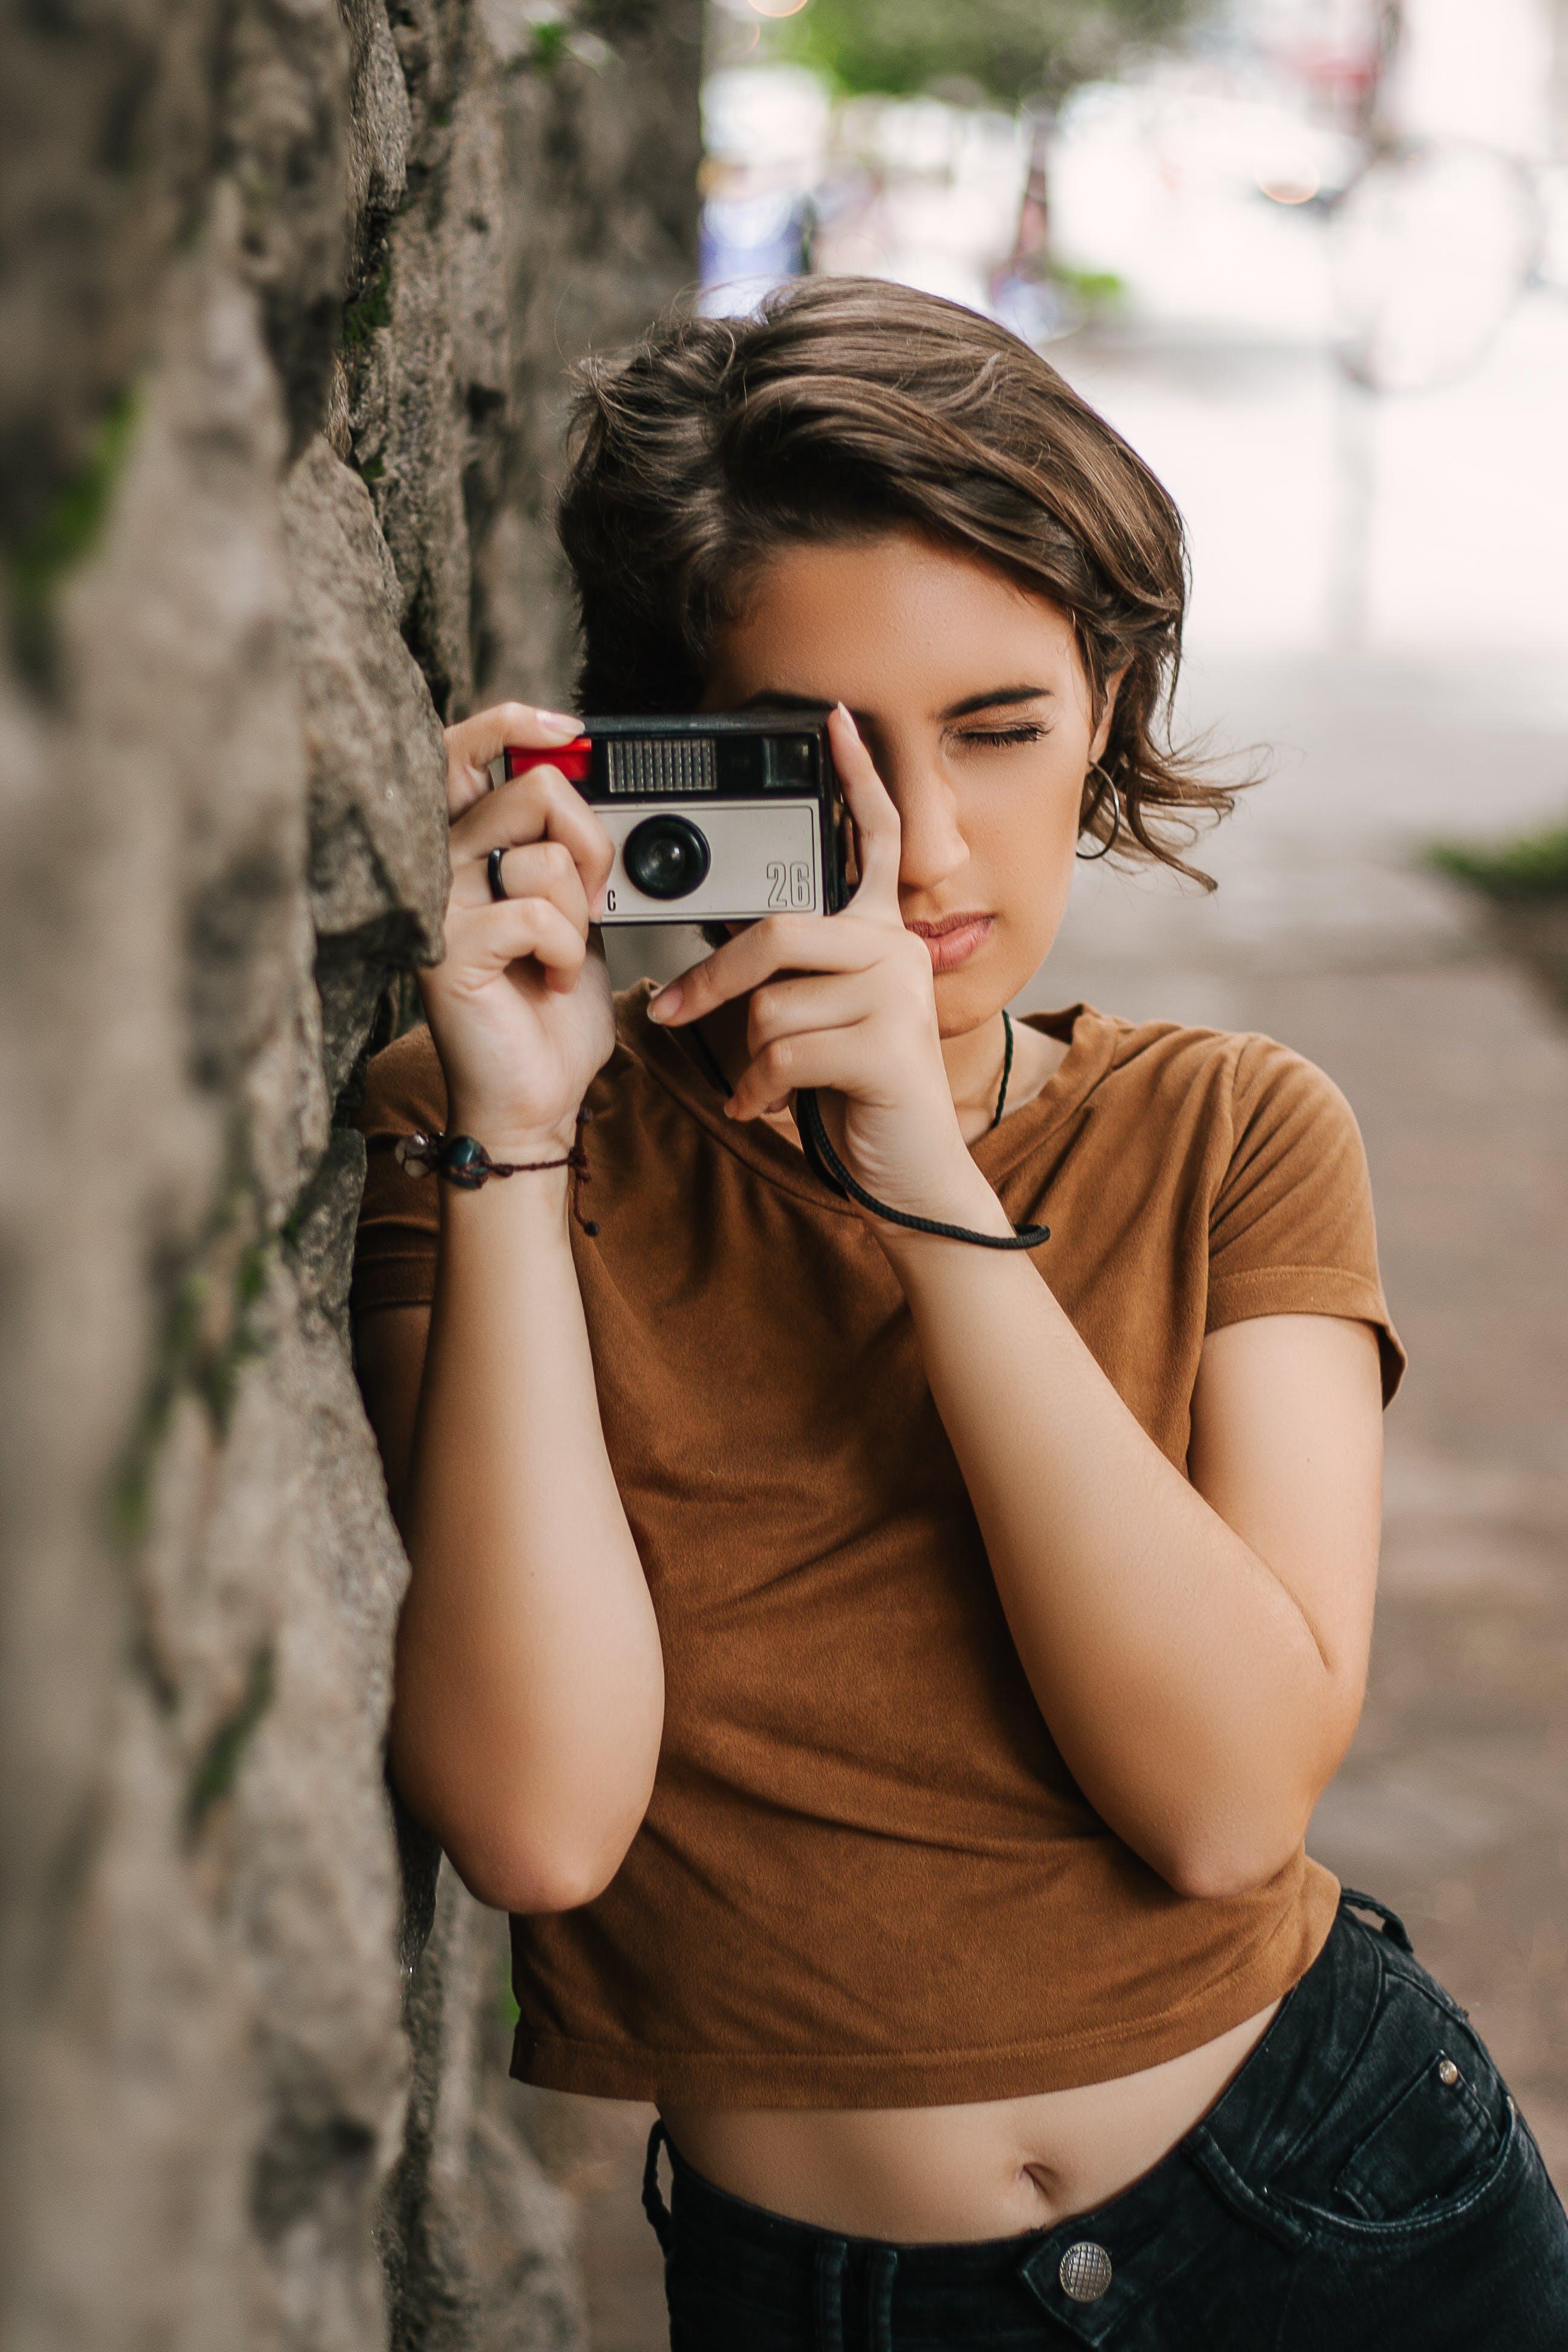 Kostnadsfri bild av analog, brunett, fritid, kamera